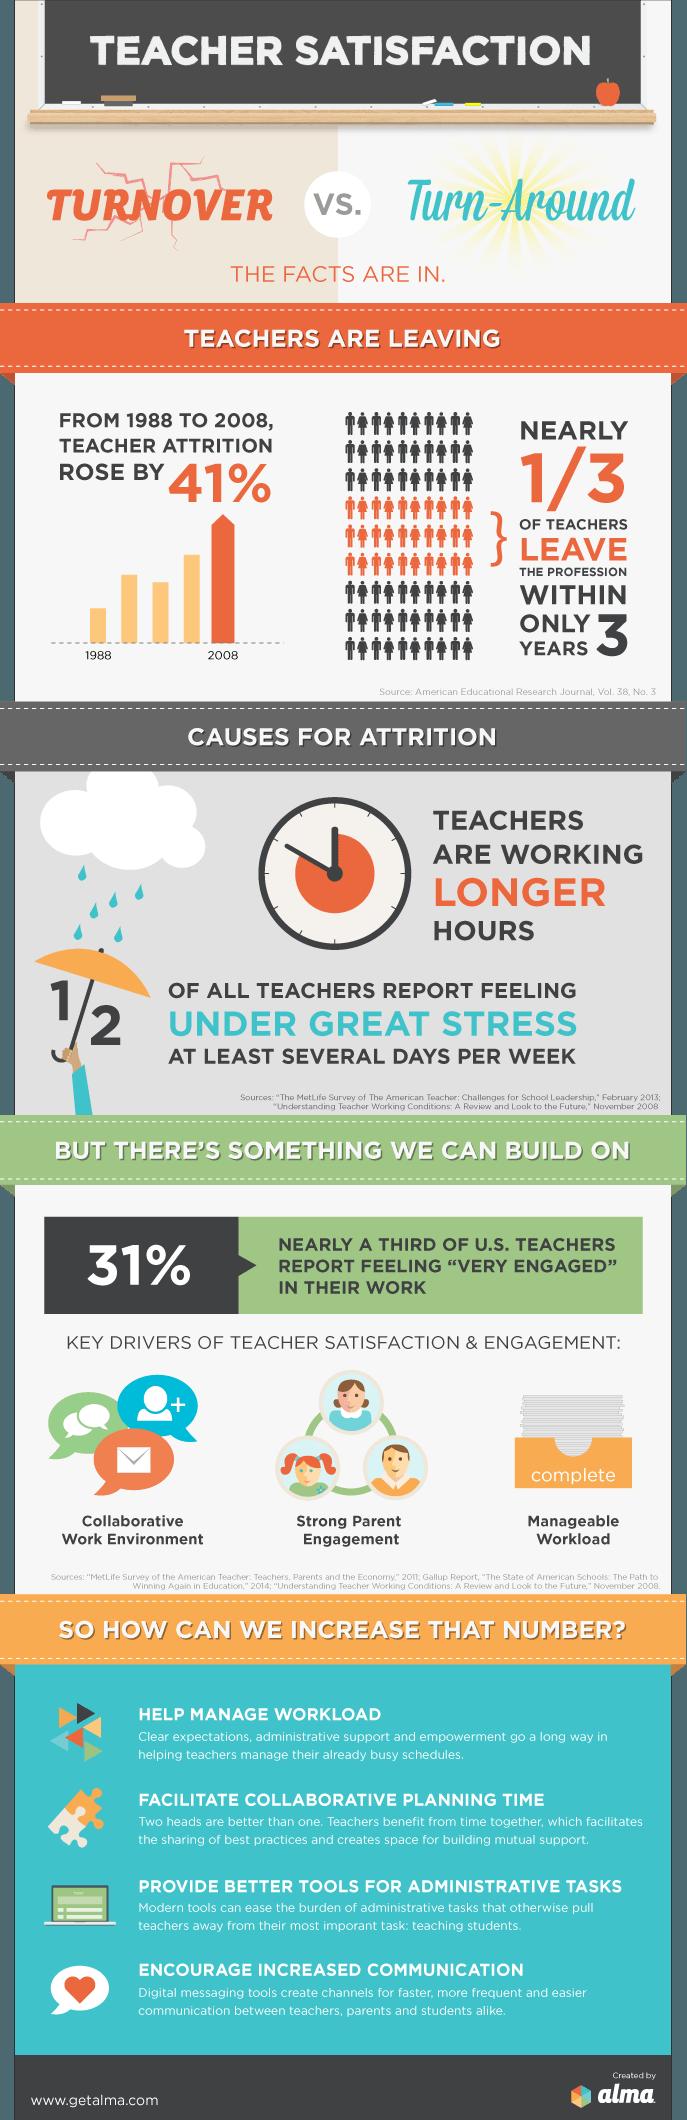 The Teacher Satisfaction Infographic